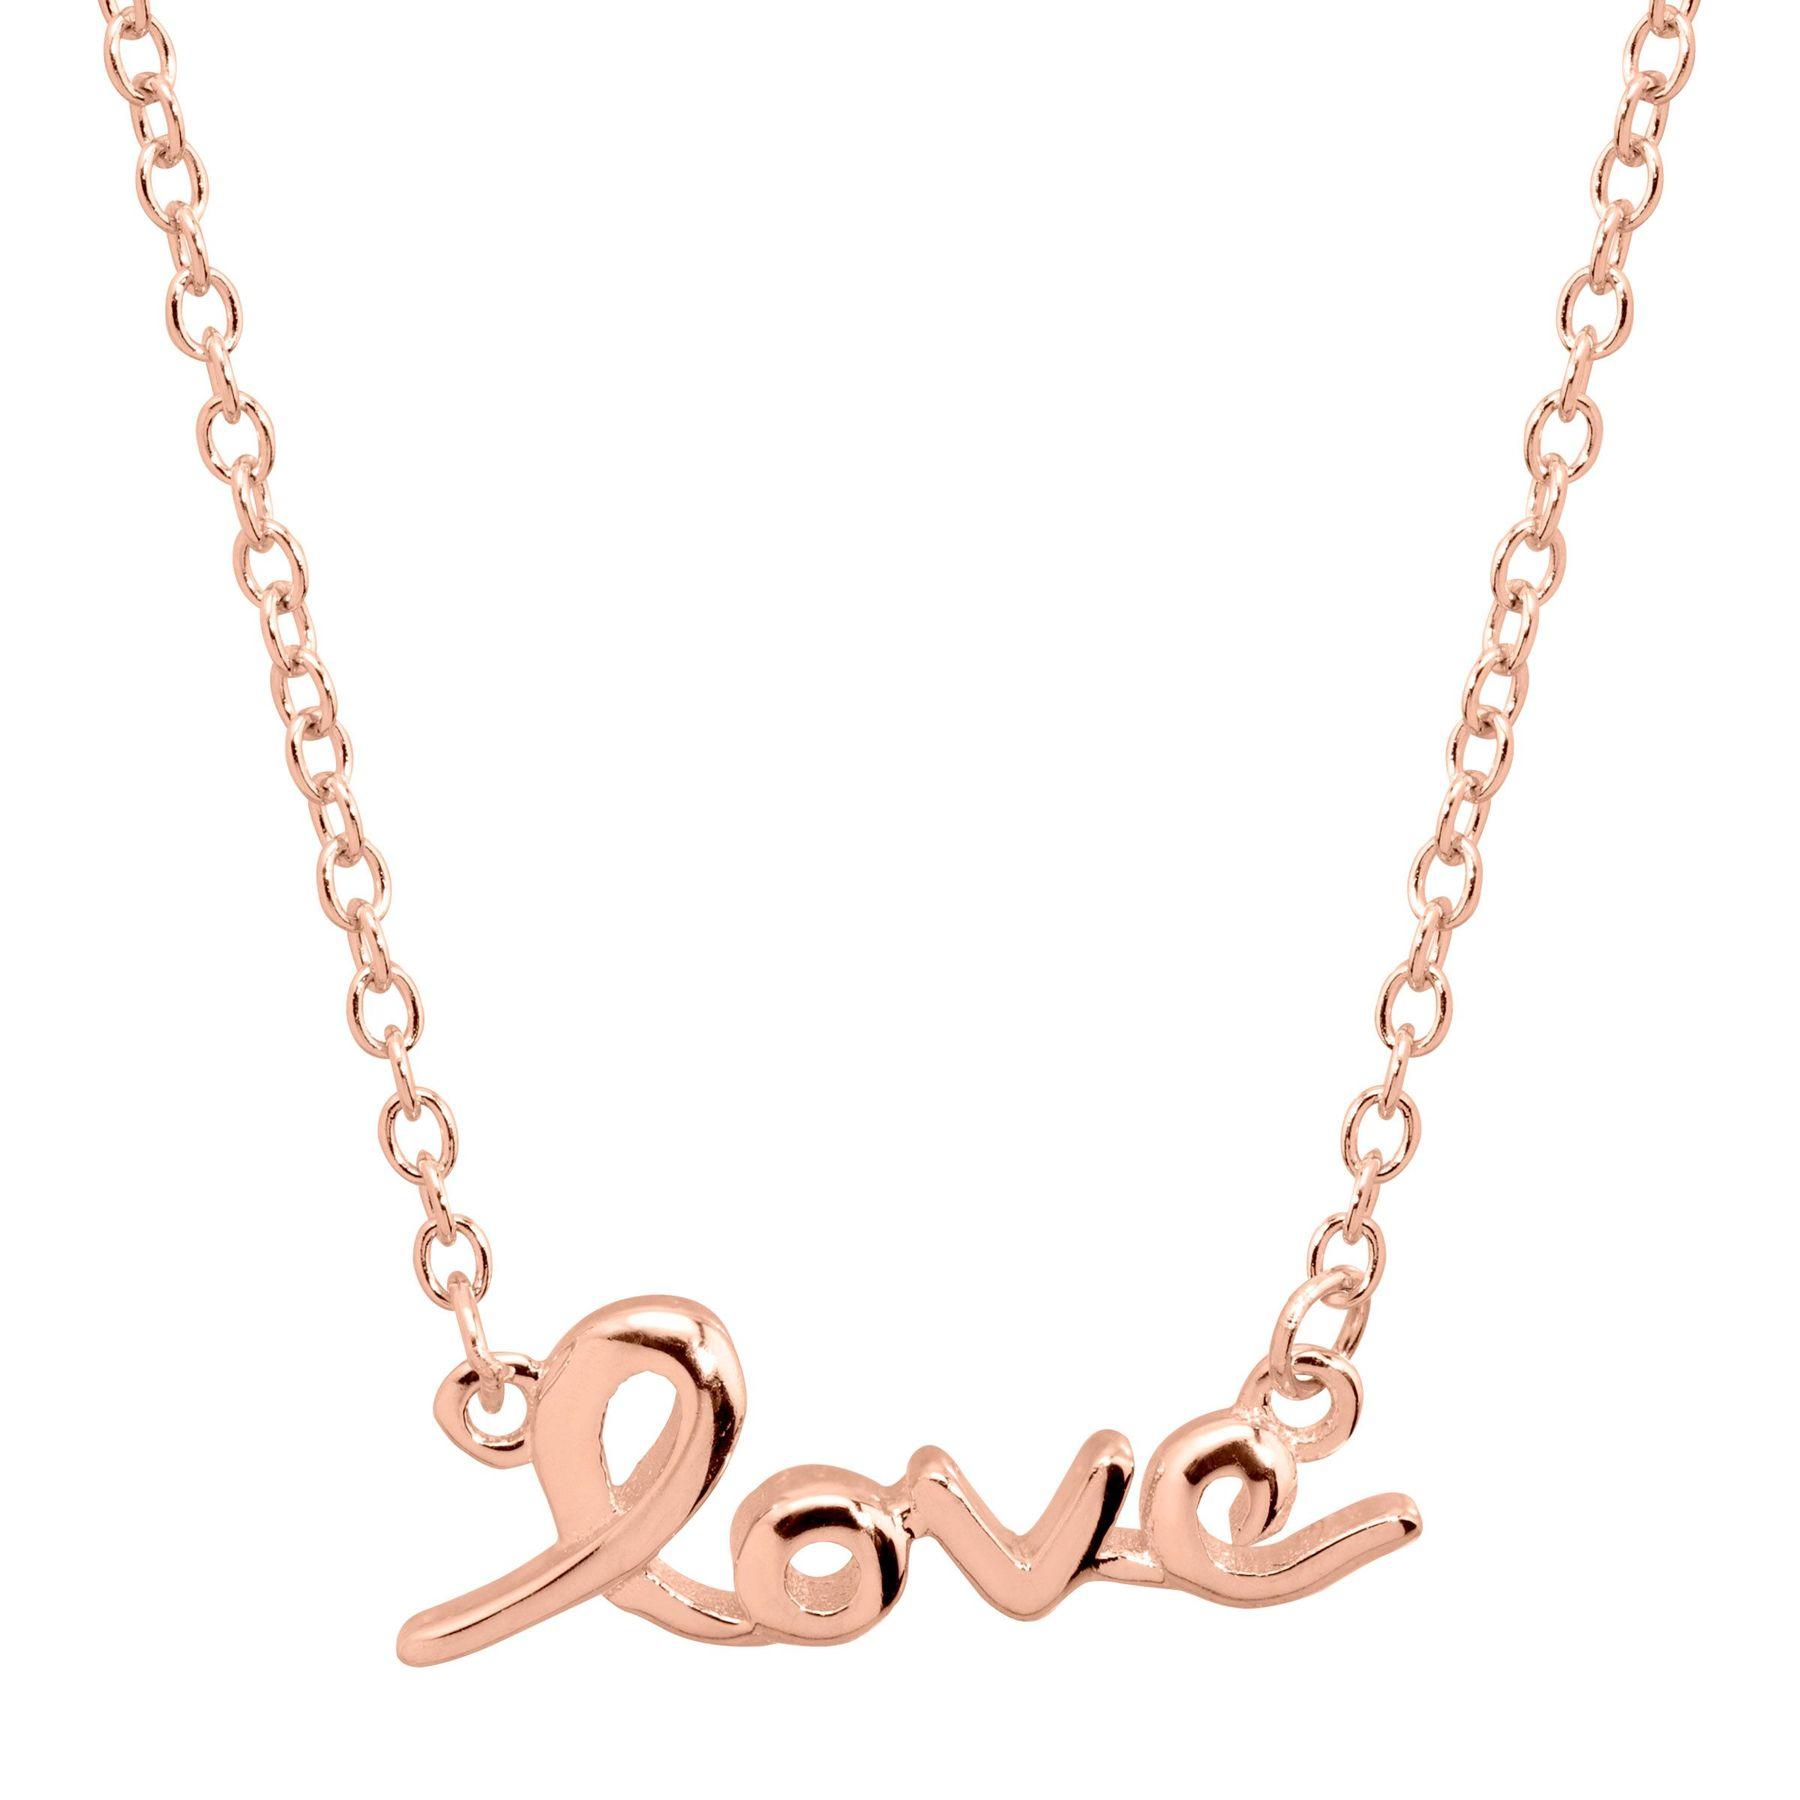 Finecraft 'Love' Script Necklace